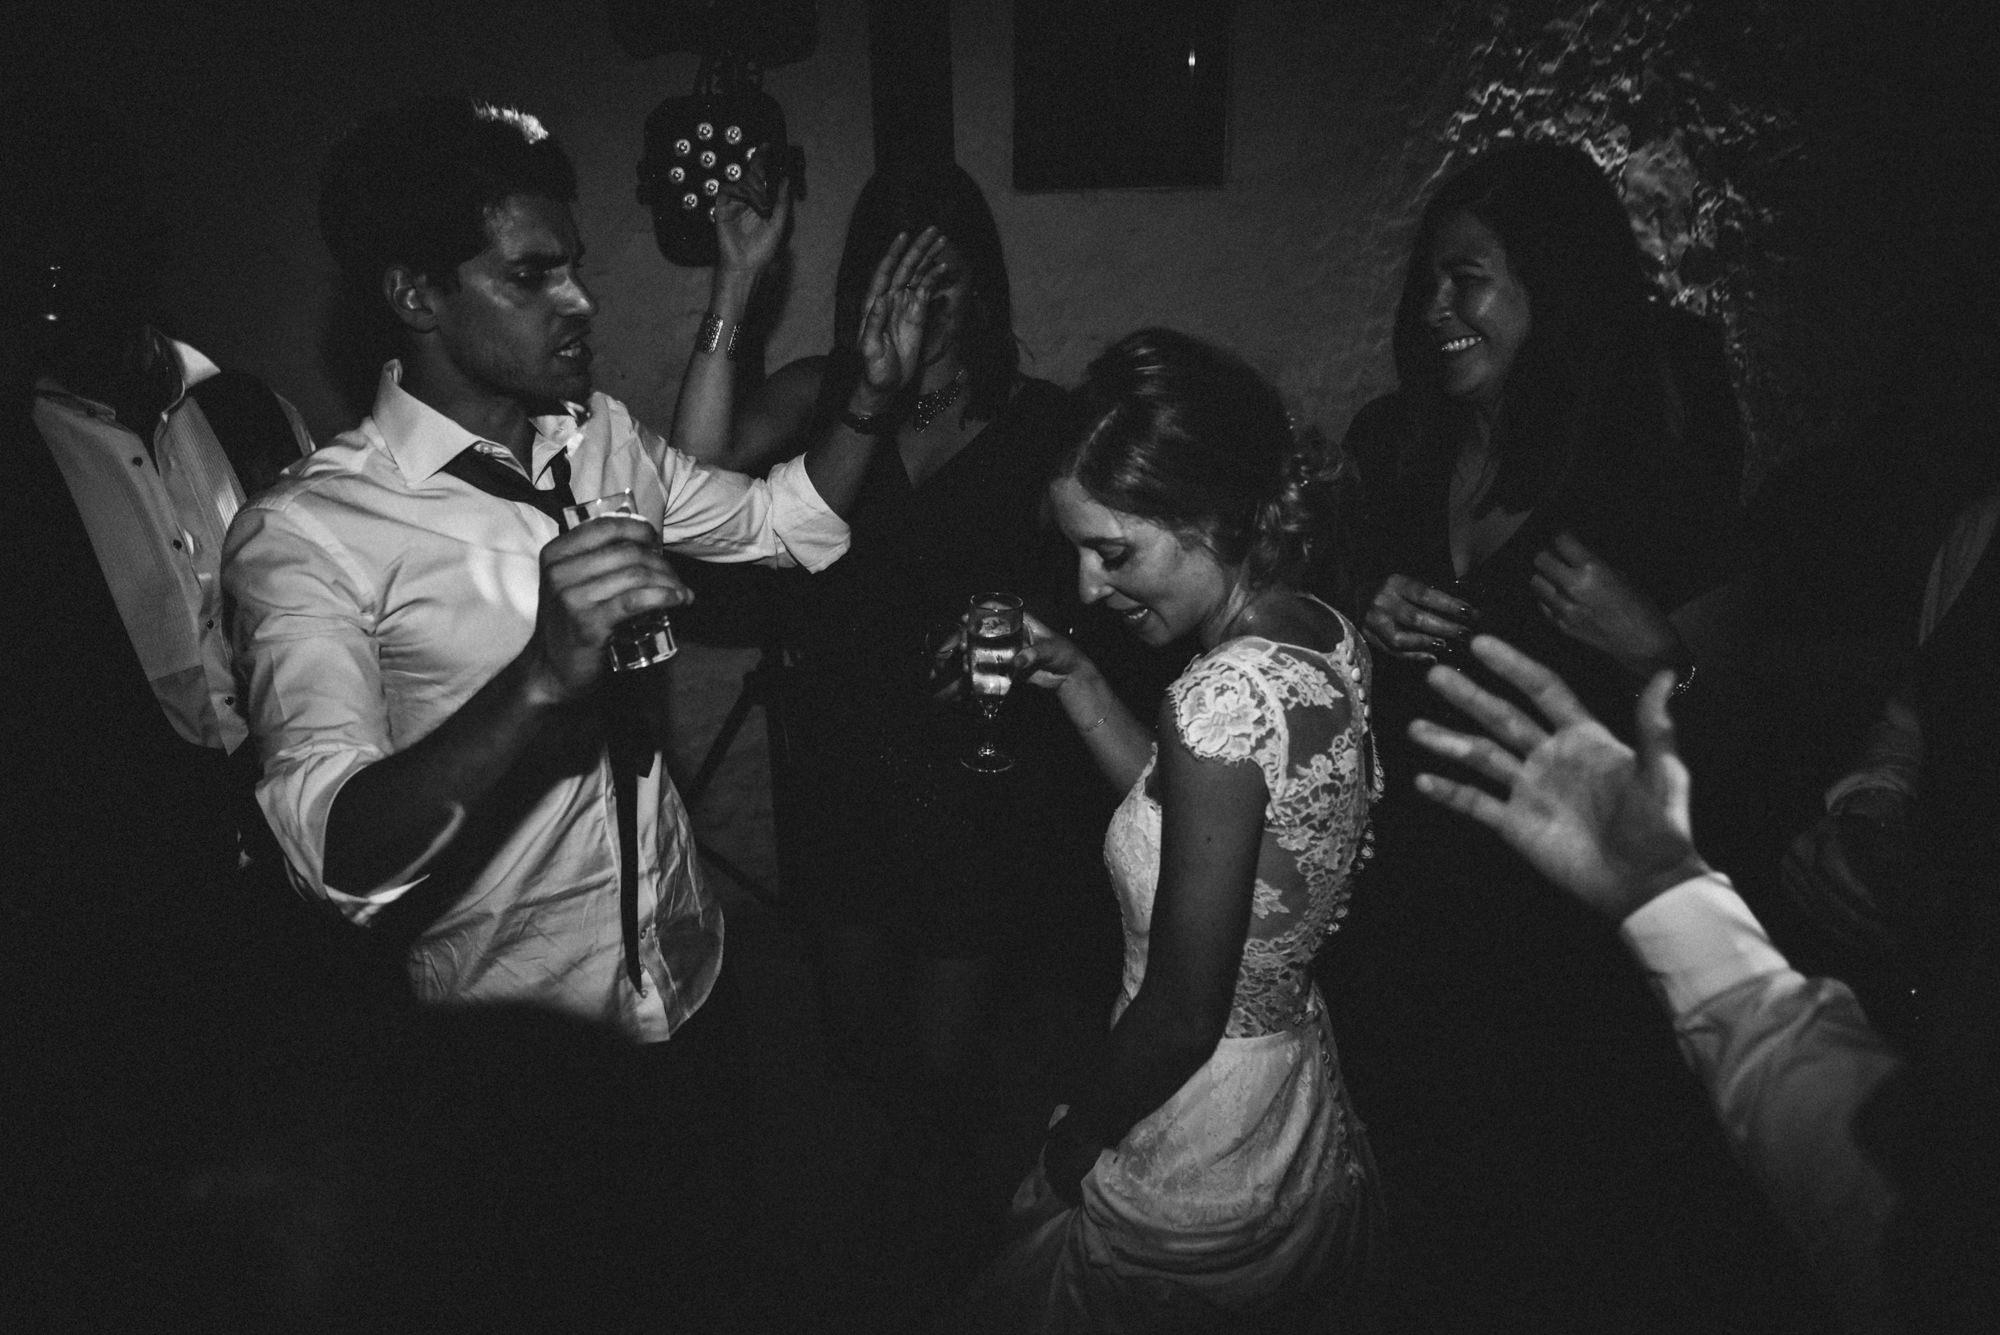 photographe-mariage-paris-nantes-provence-angers-67